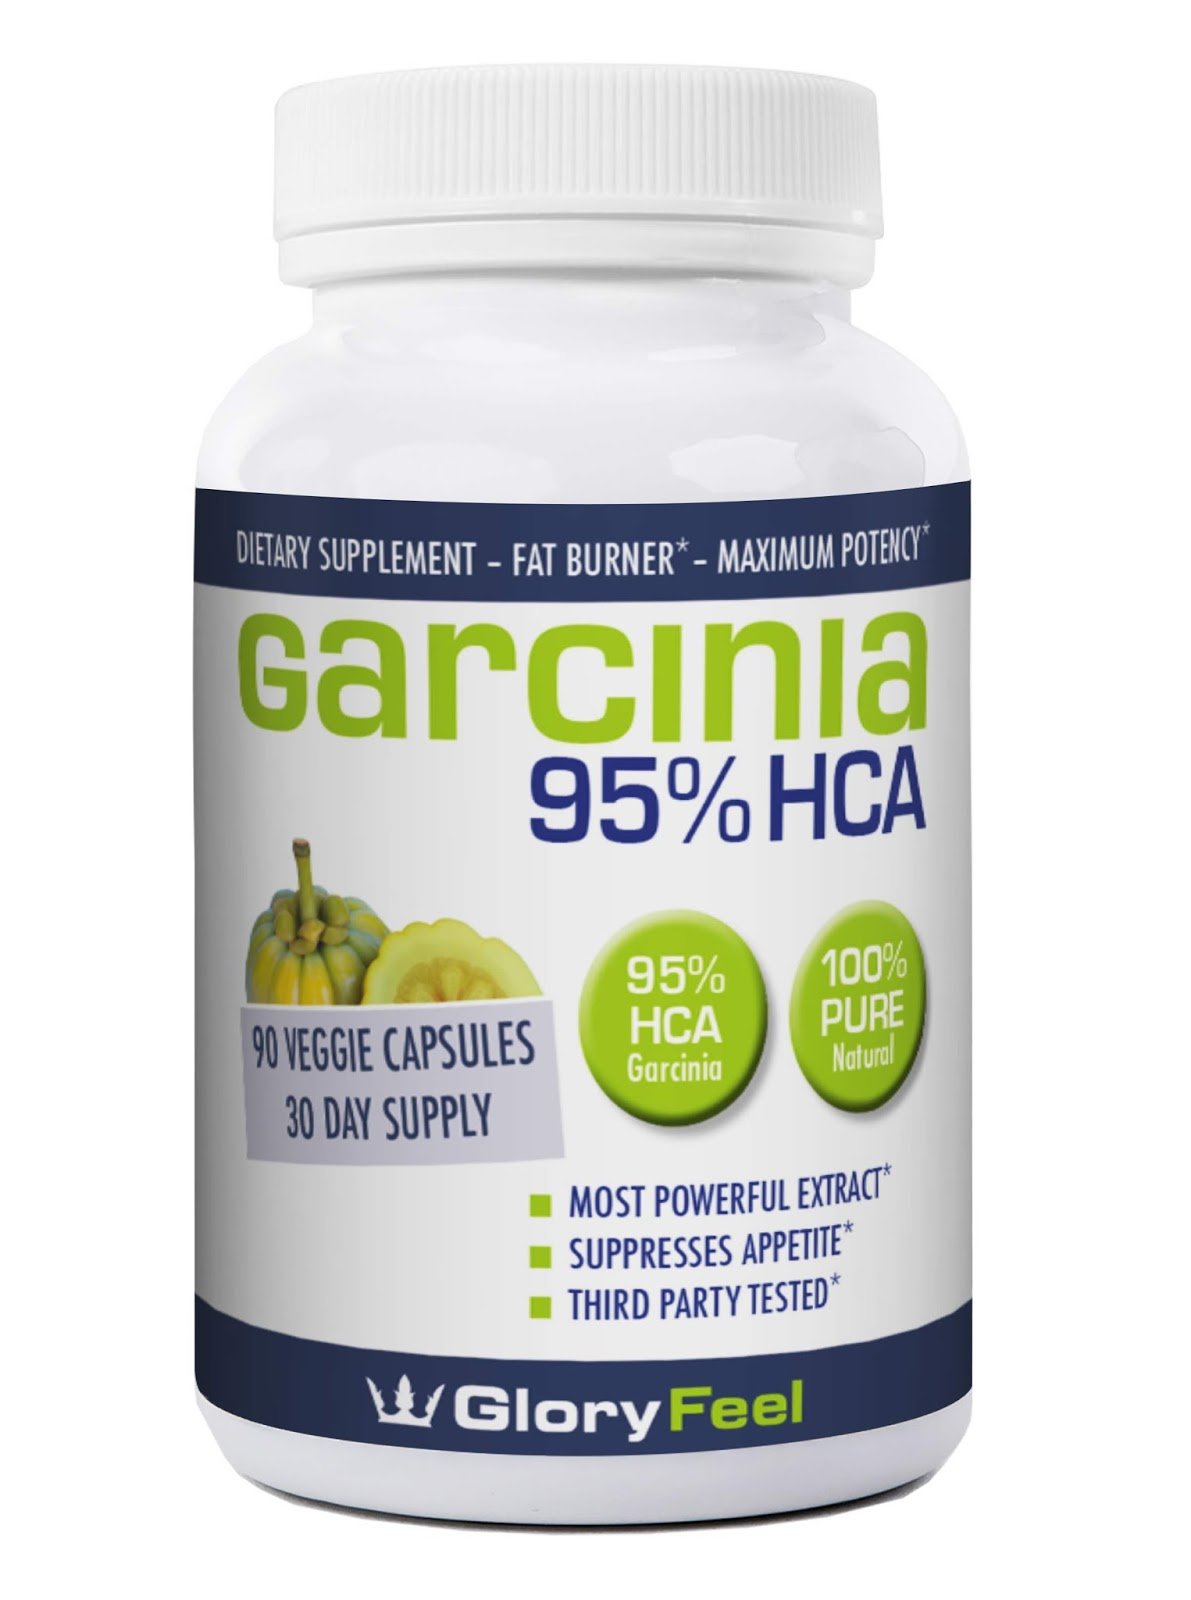 Mygreatfinds Glory Feel 95 Hca Garcinia Cambogia Supplement Review